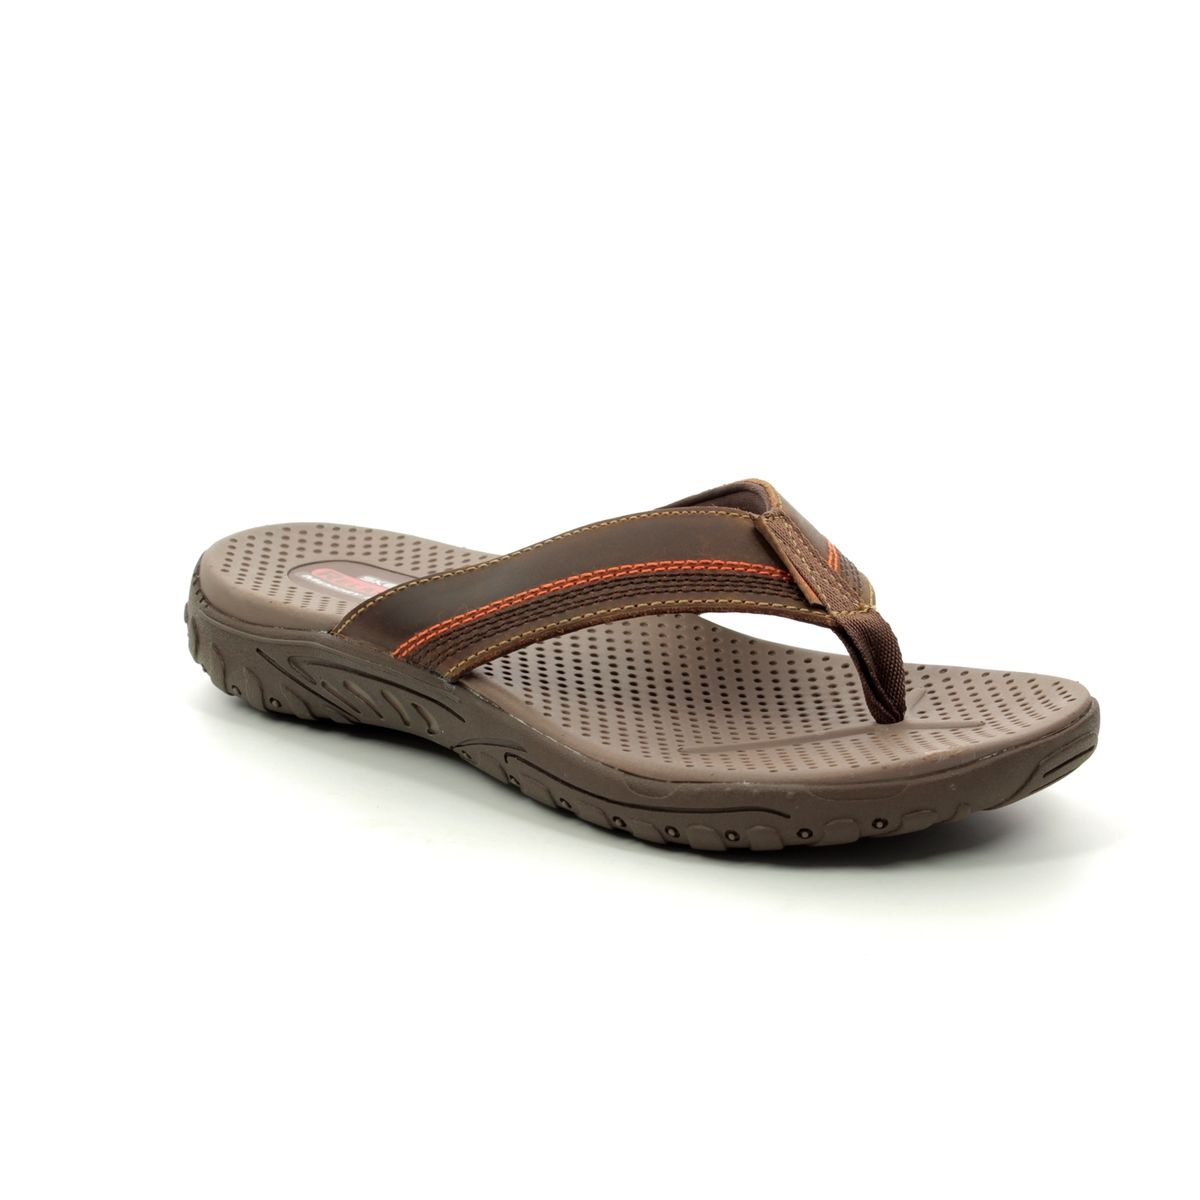 f56c69cb589d Skechers Reggae Cobano 65460 BRN Brown sandals